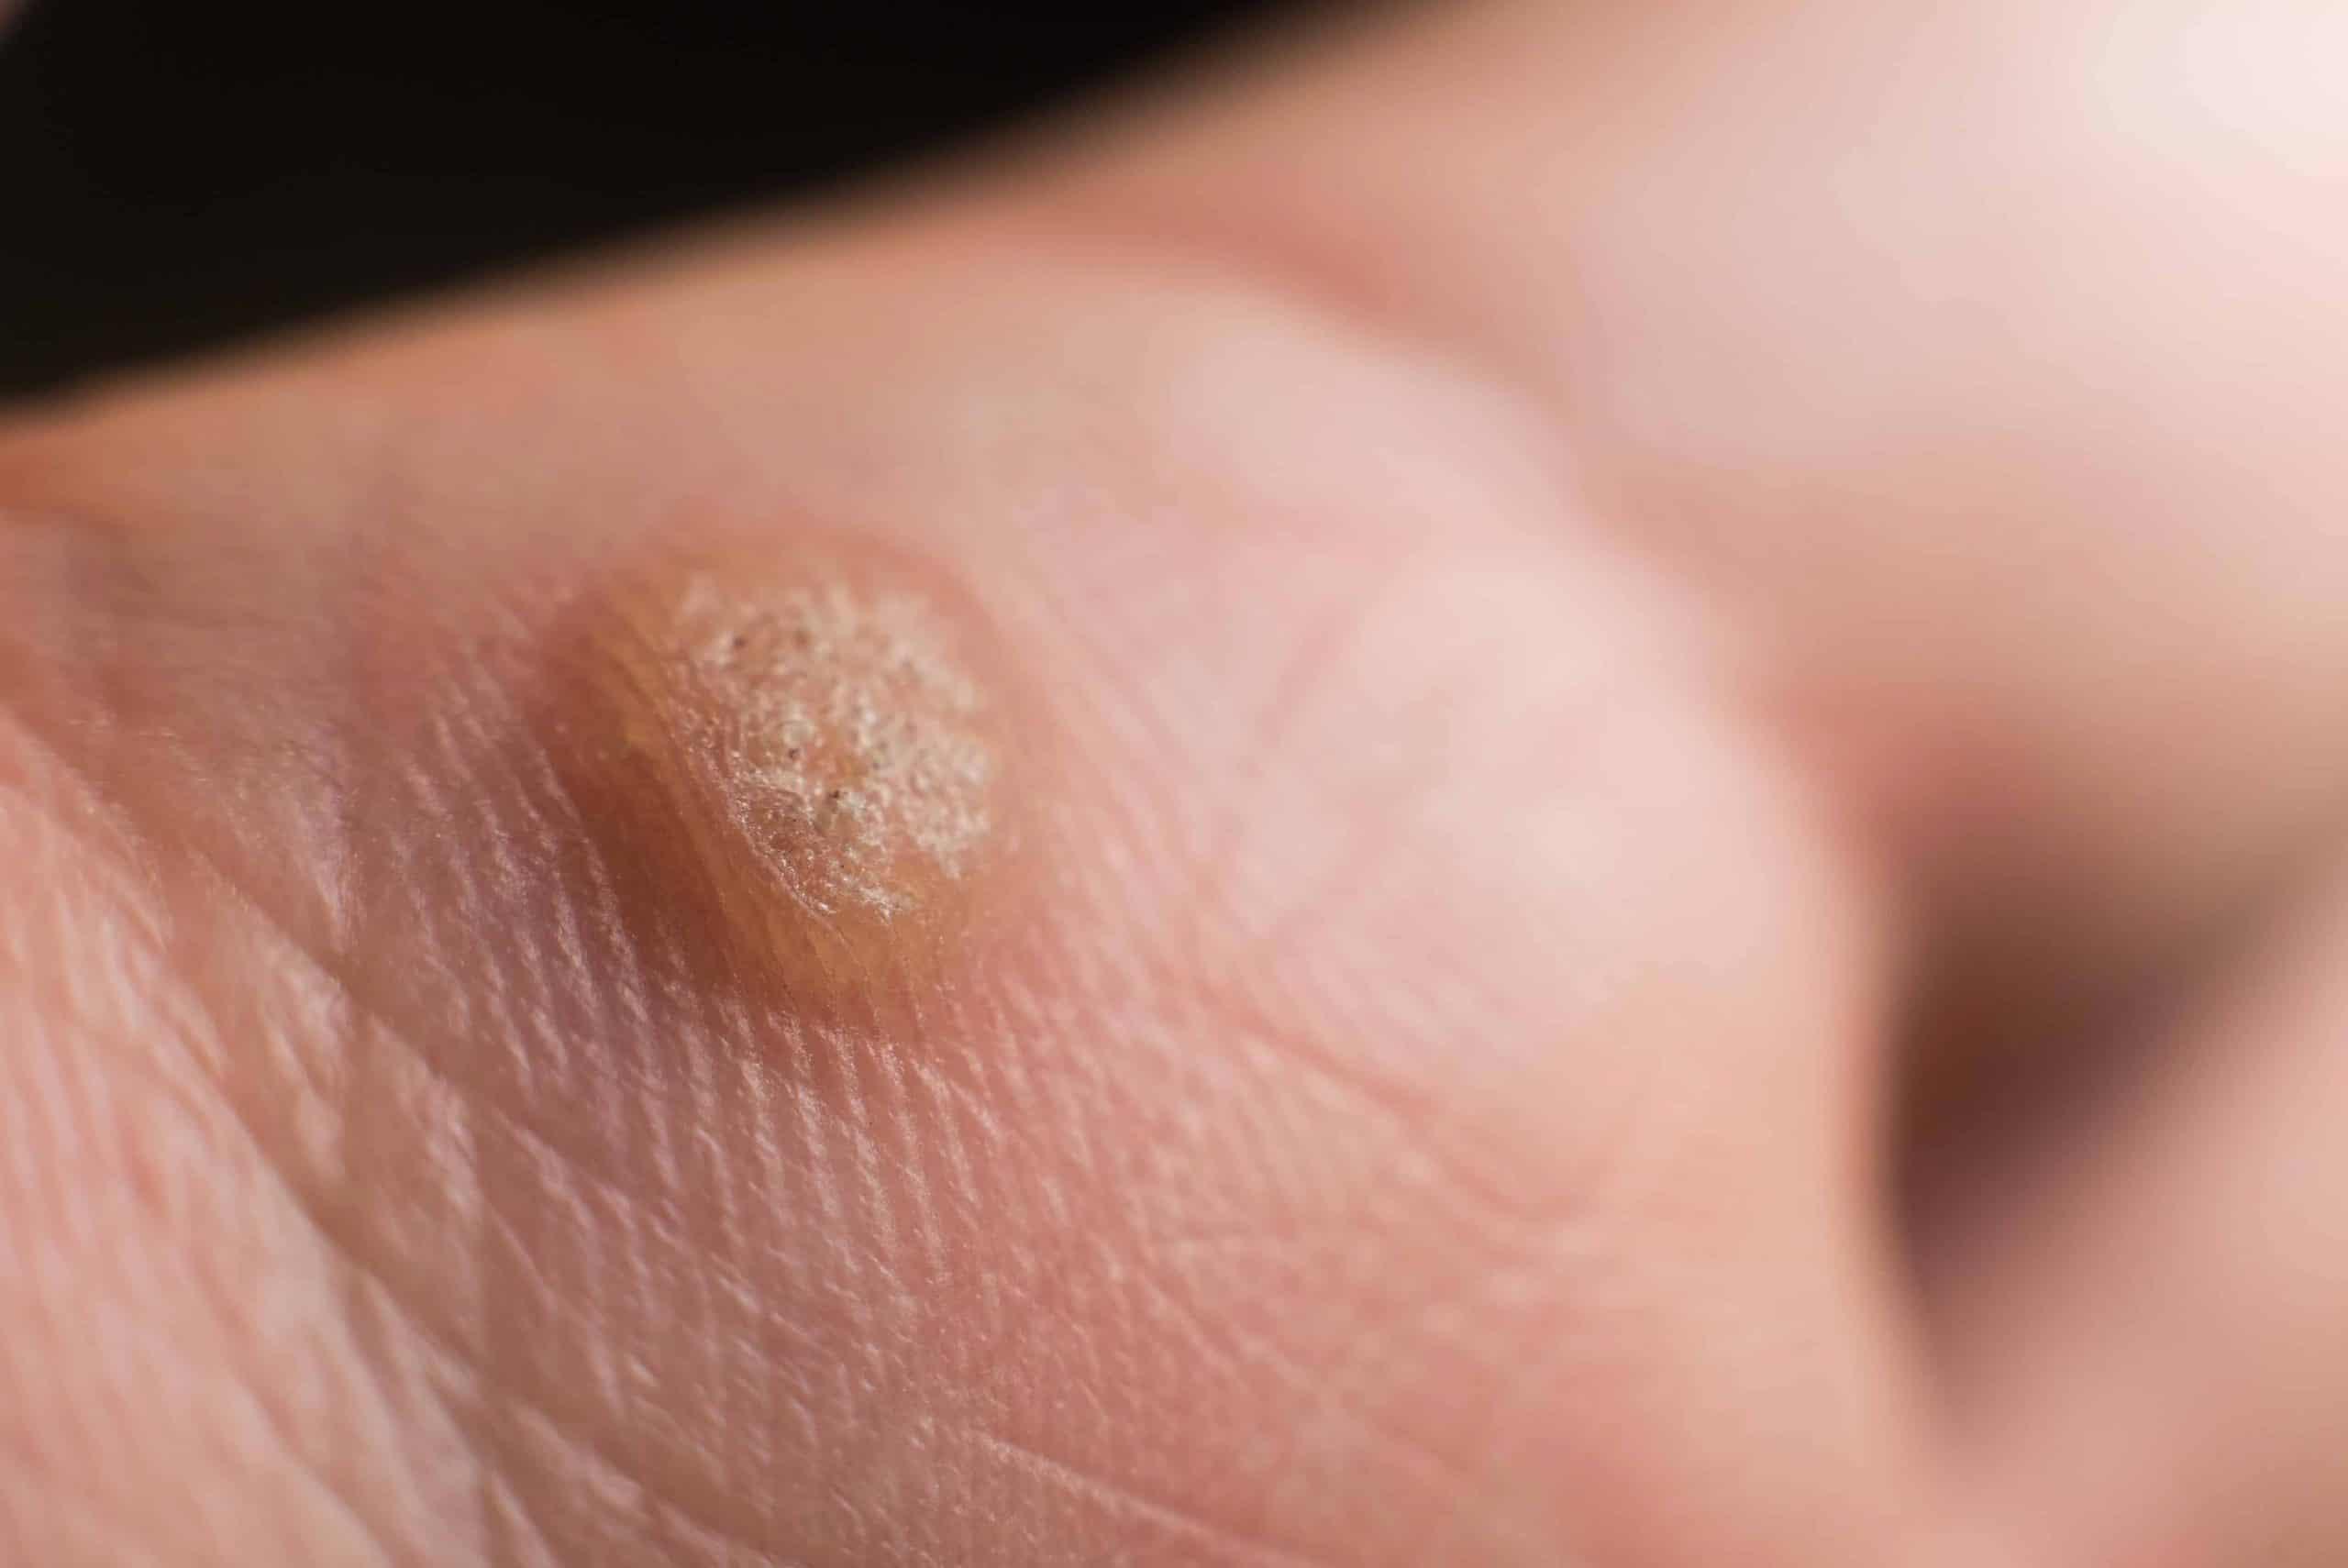 Hpv that causes warts on hands, Traducerea «papillomavirus» în 25 de limbi